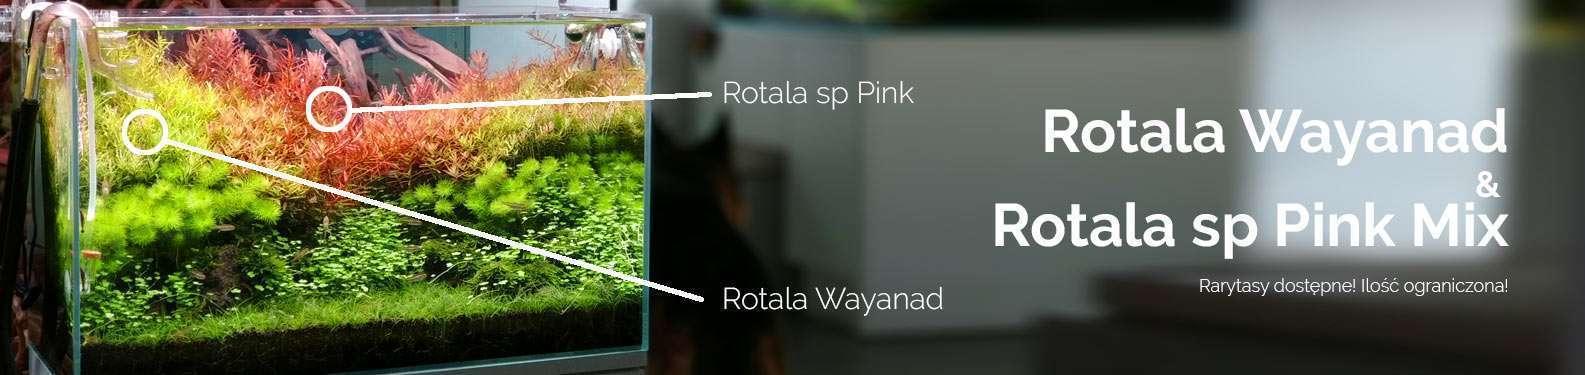 Rotala Wayanad & Rotala sp Pink